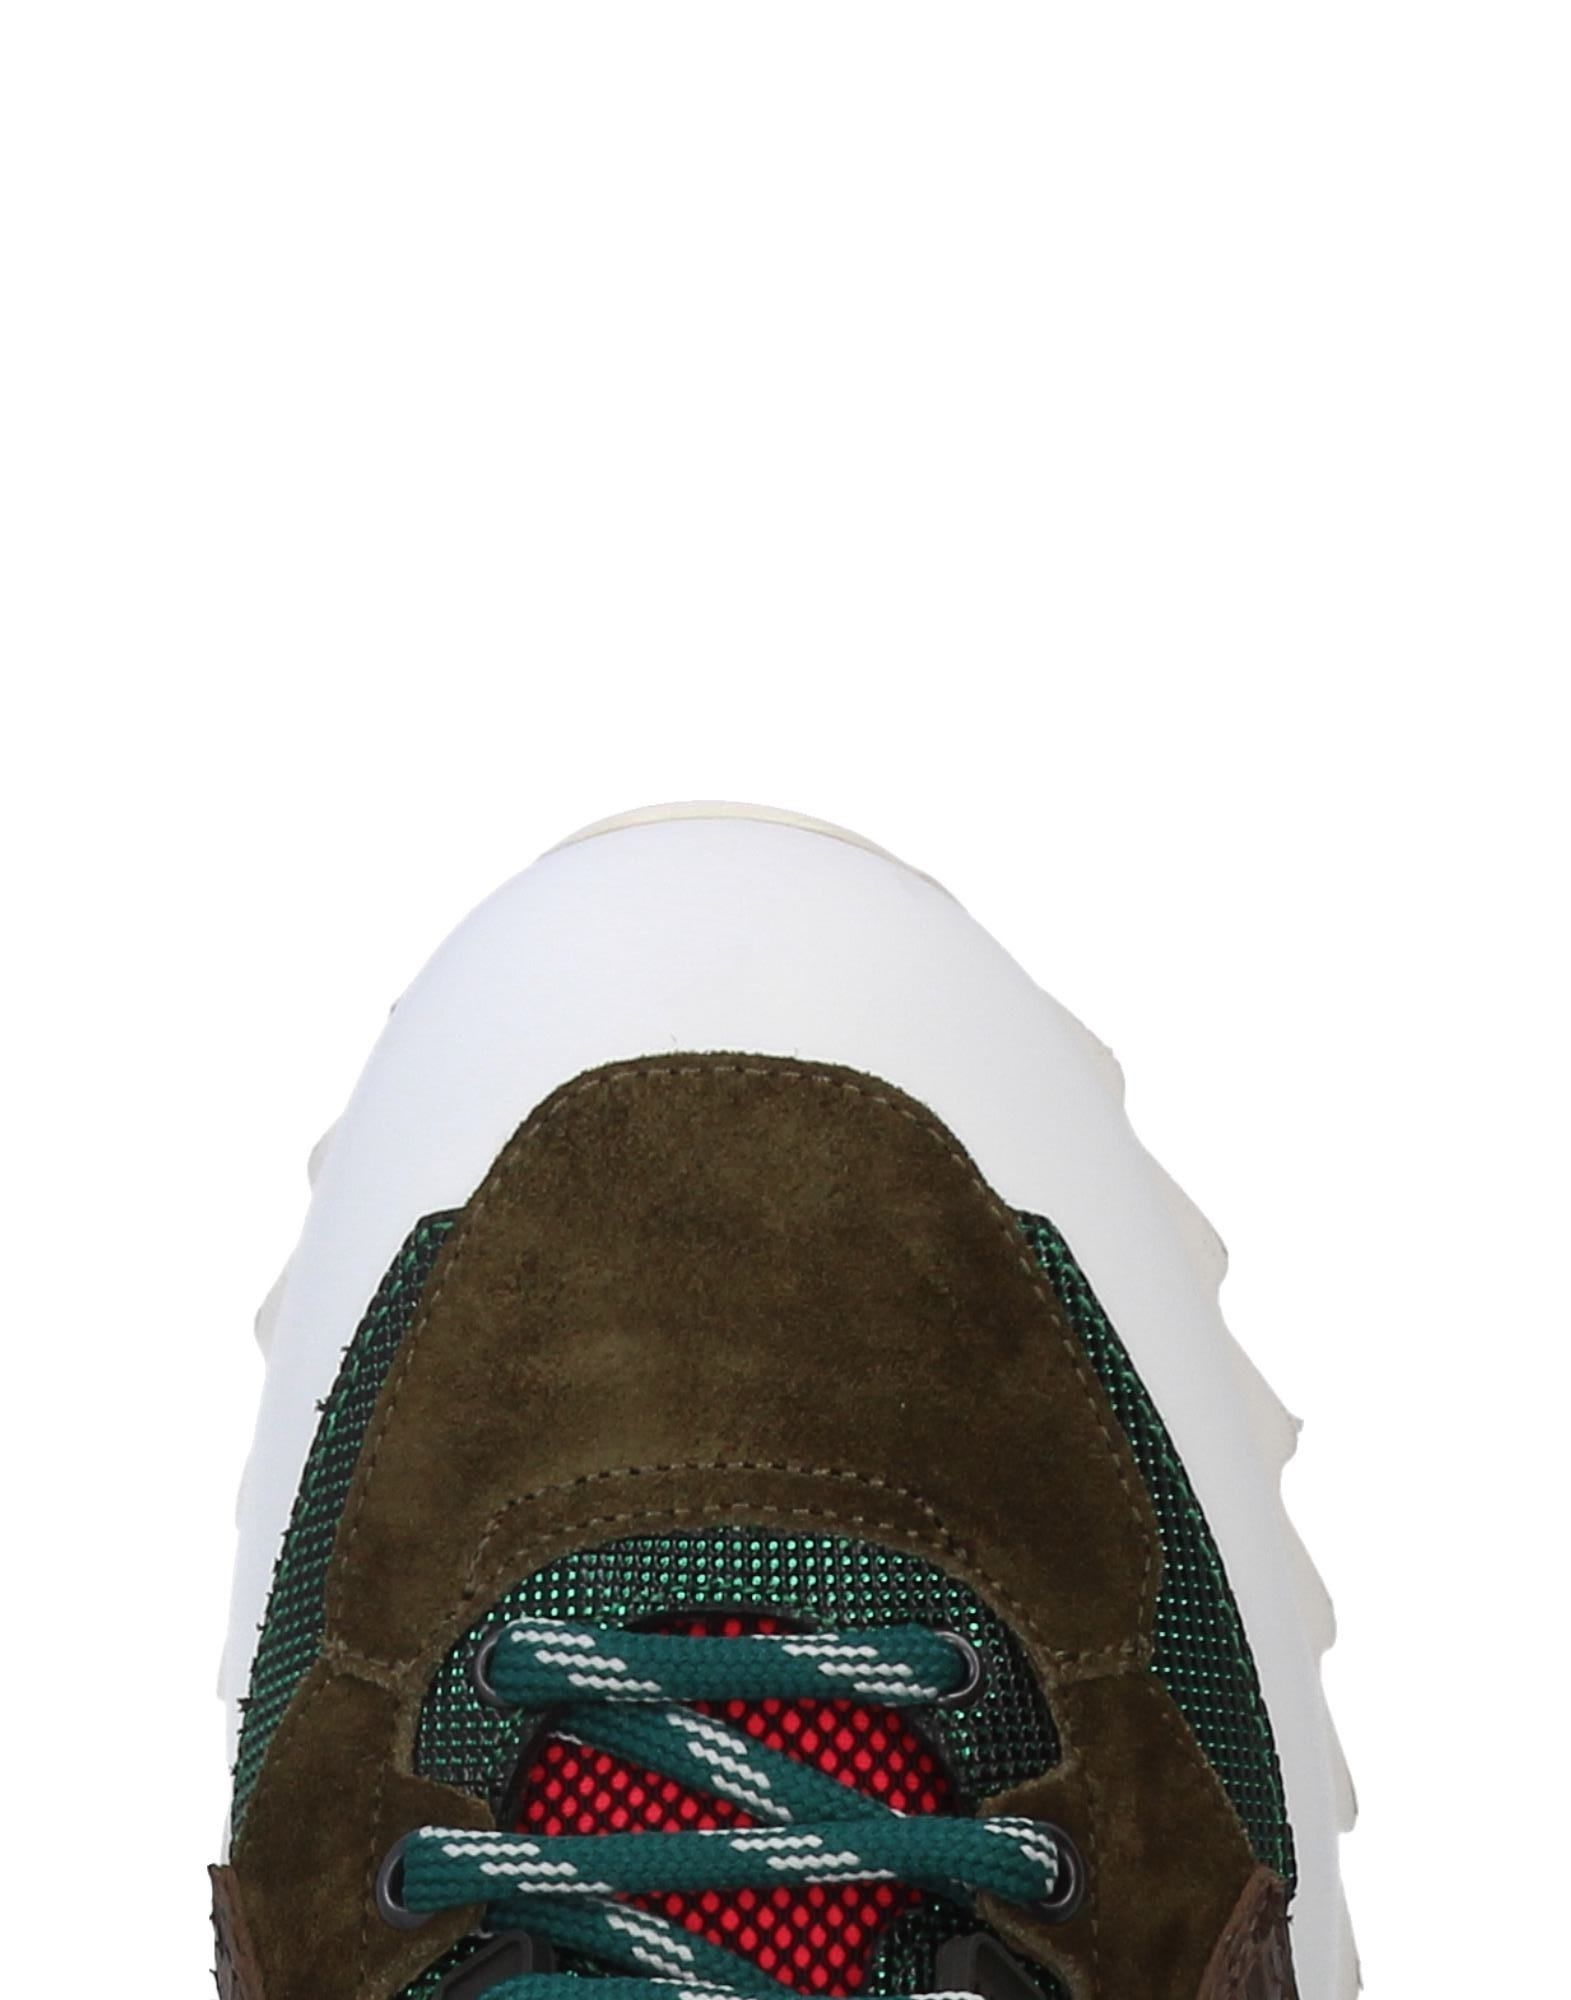 Les Hommes Sneakers Sneakers Hommes Herren  11377389UC c5bc6d